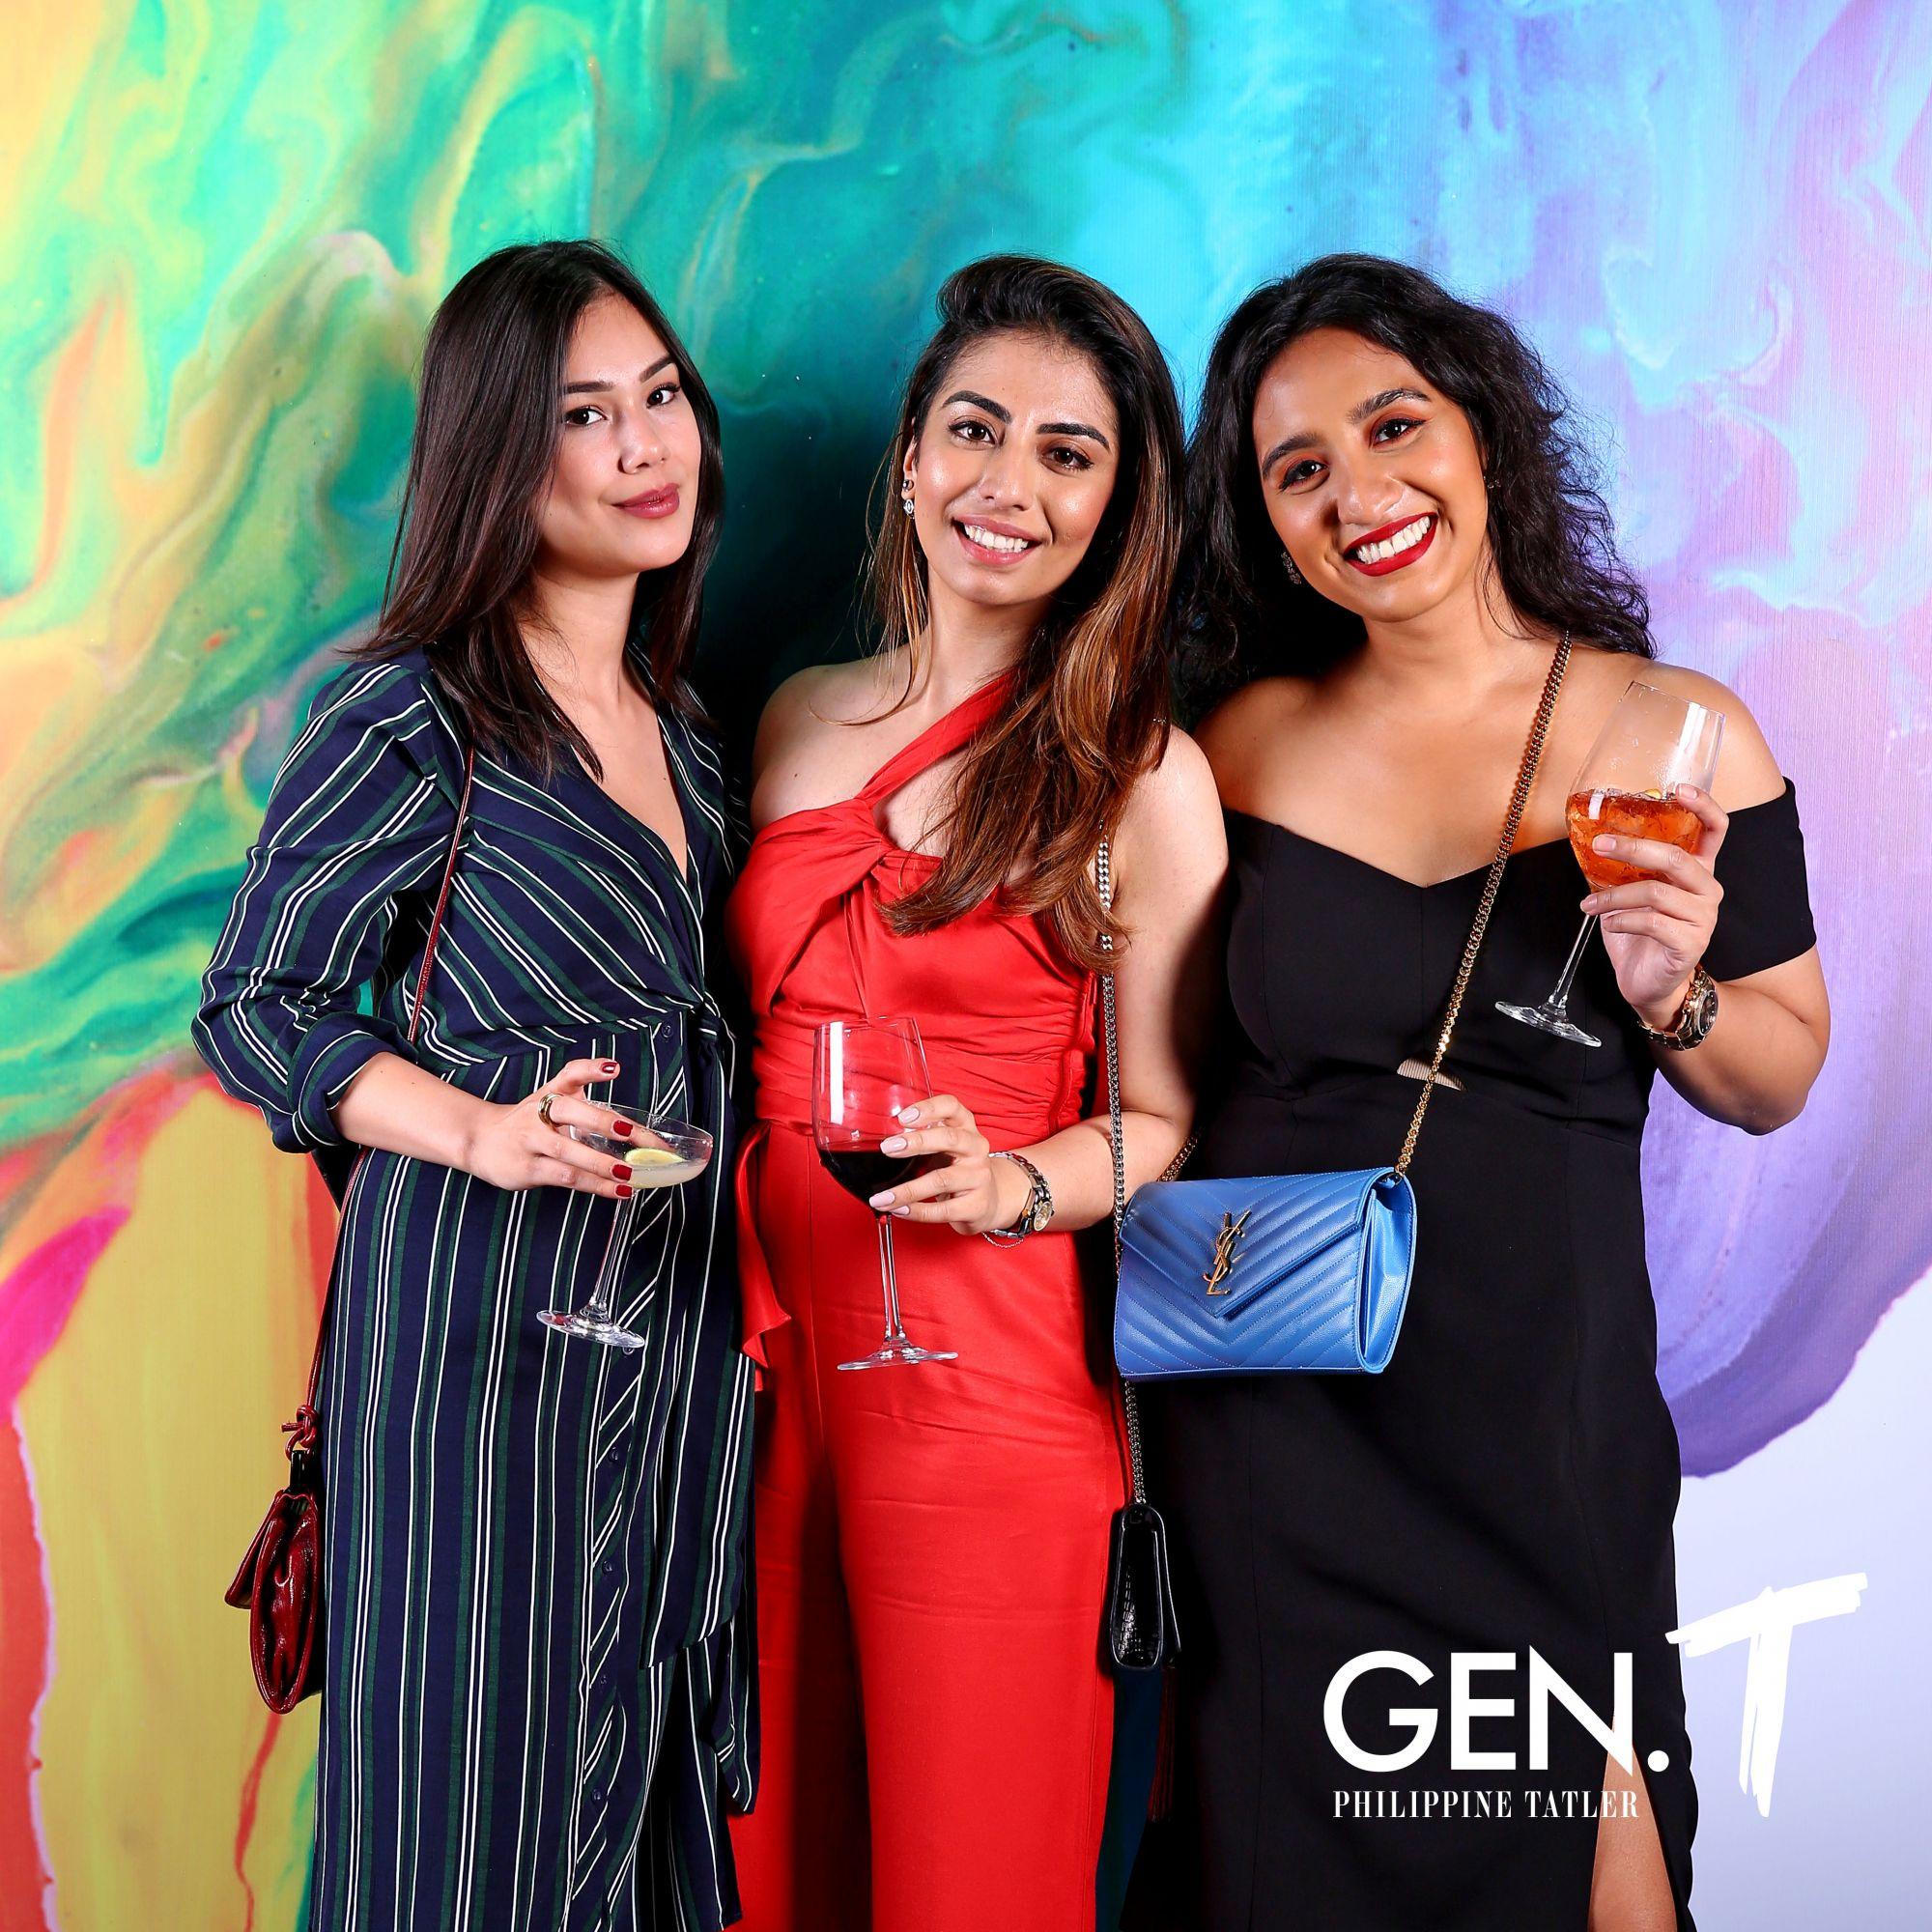 Camilla Guidicelli, Neelam Gopwani and Roma Hemlani